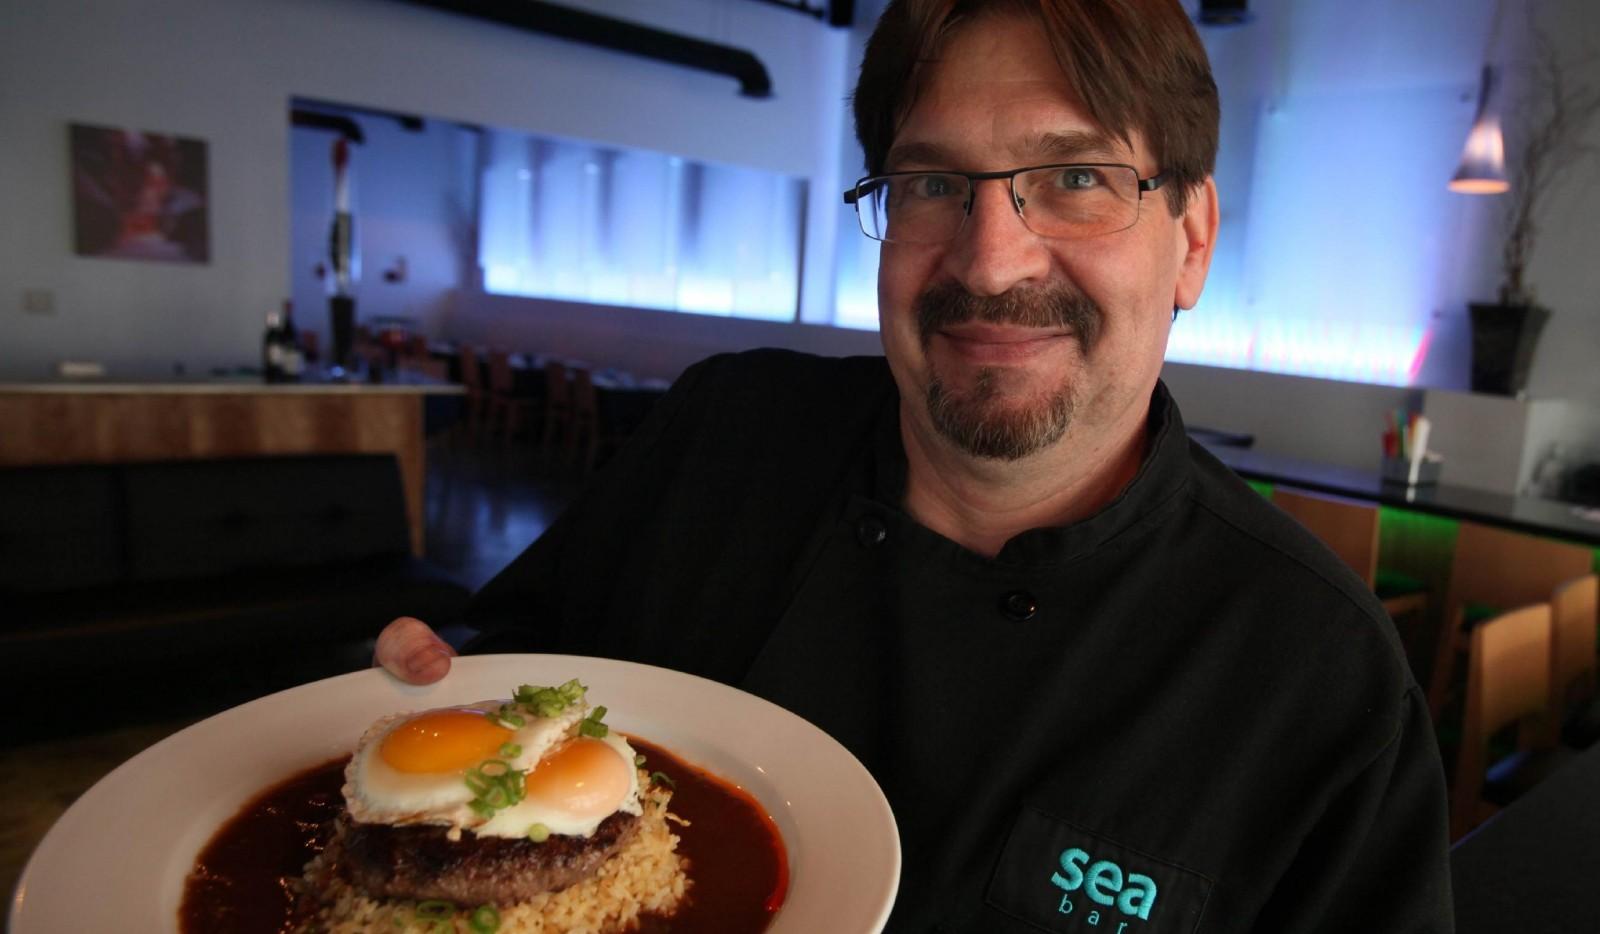 Esteemed chef Mike Andrzejewski will serve Hawaiian-influenced dishes at Midnight Mass. (Robert Kirkham/Buffalo News file photo)